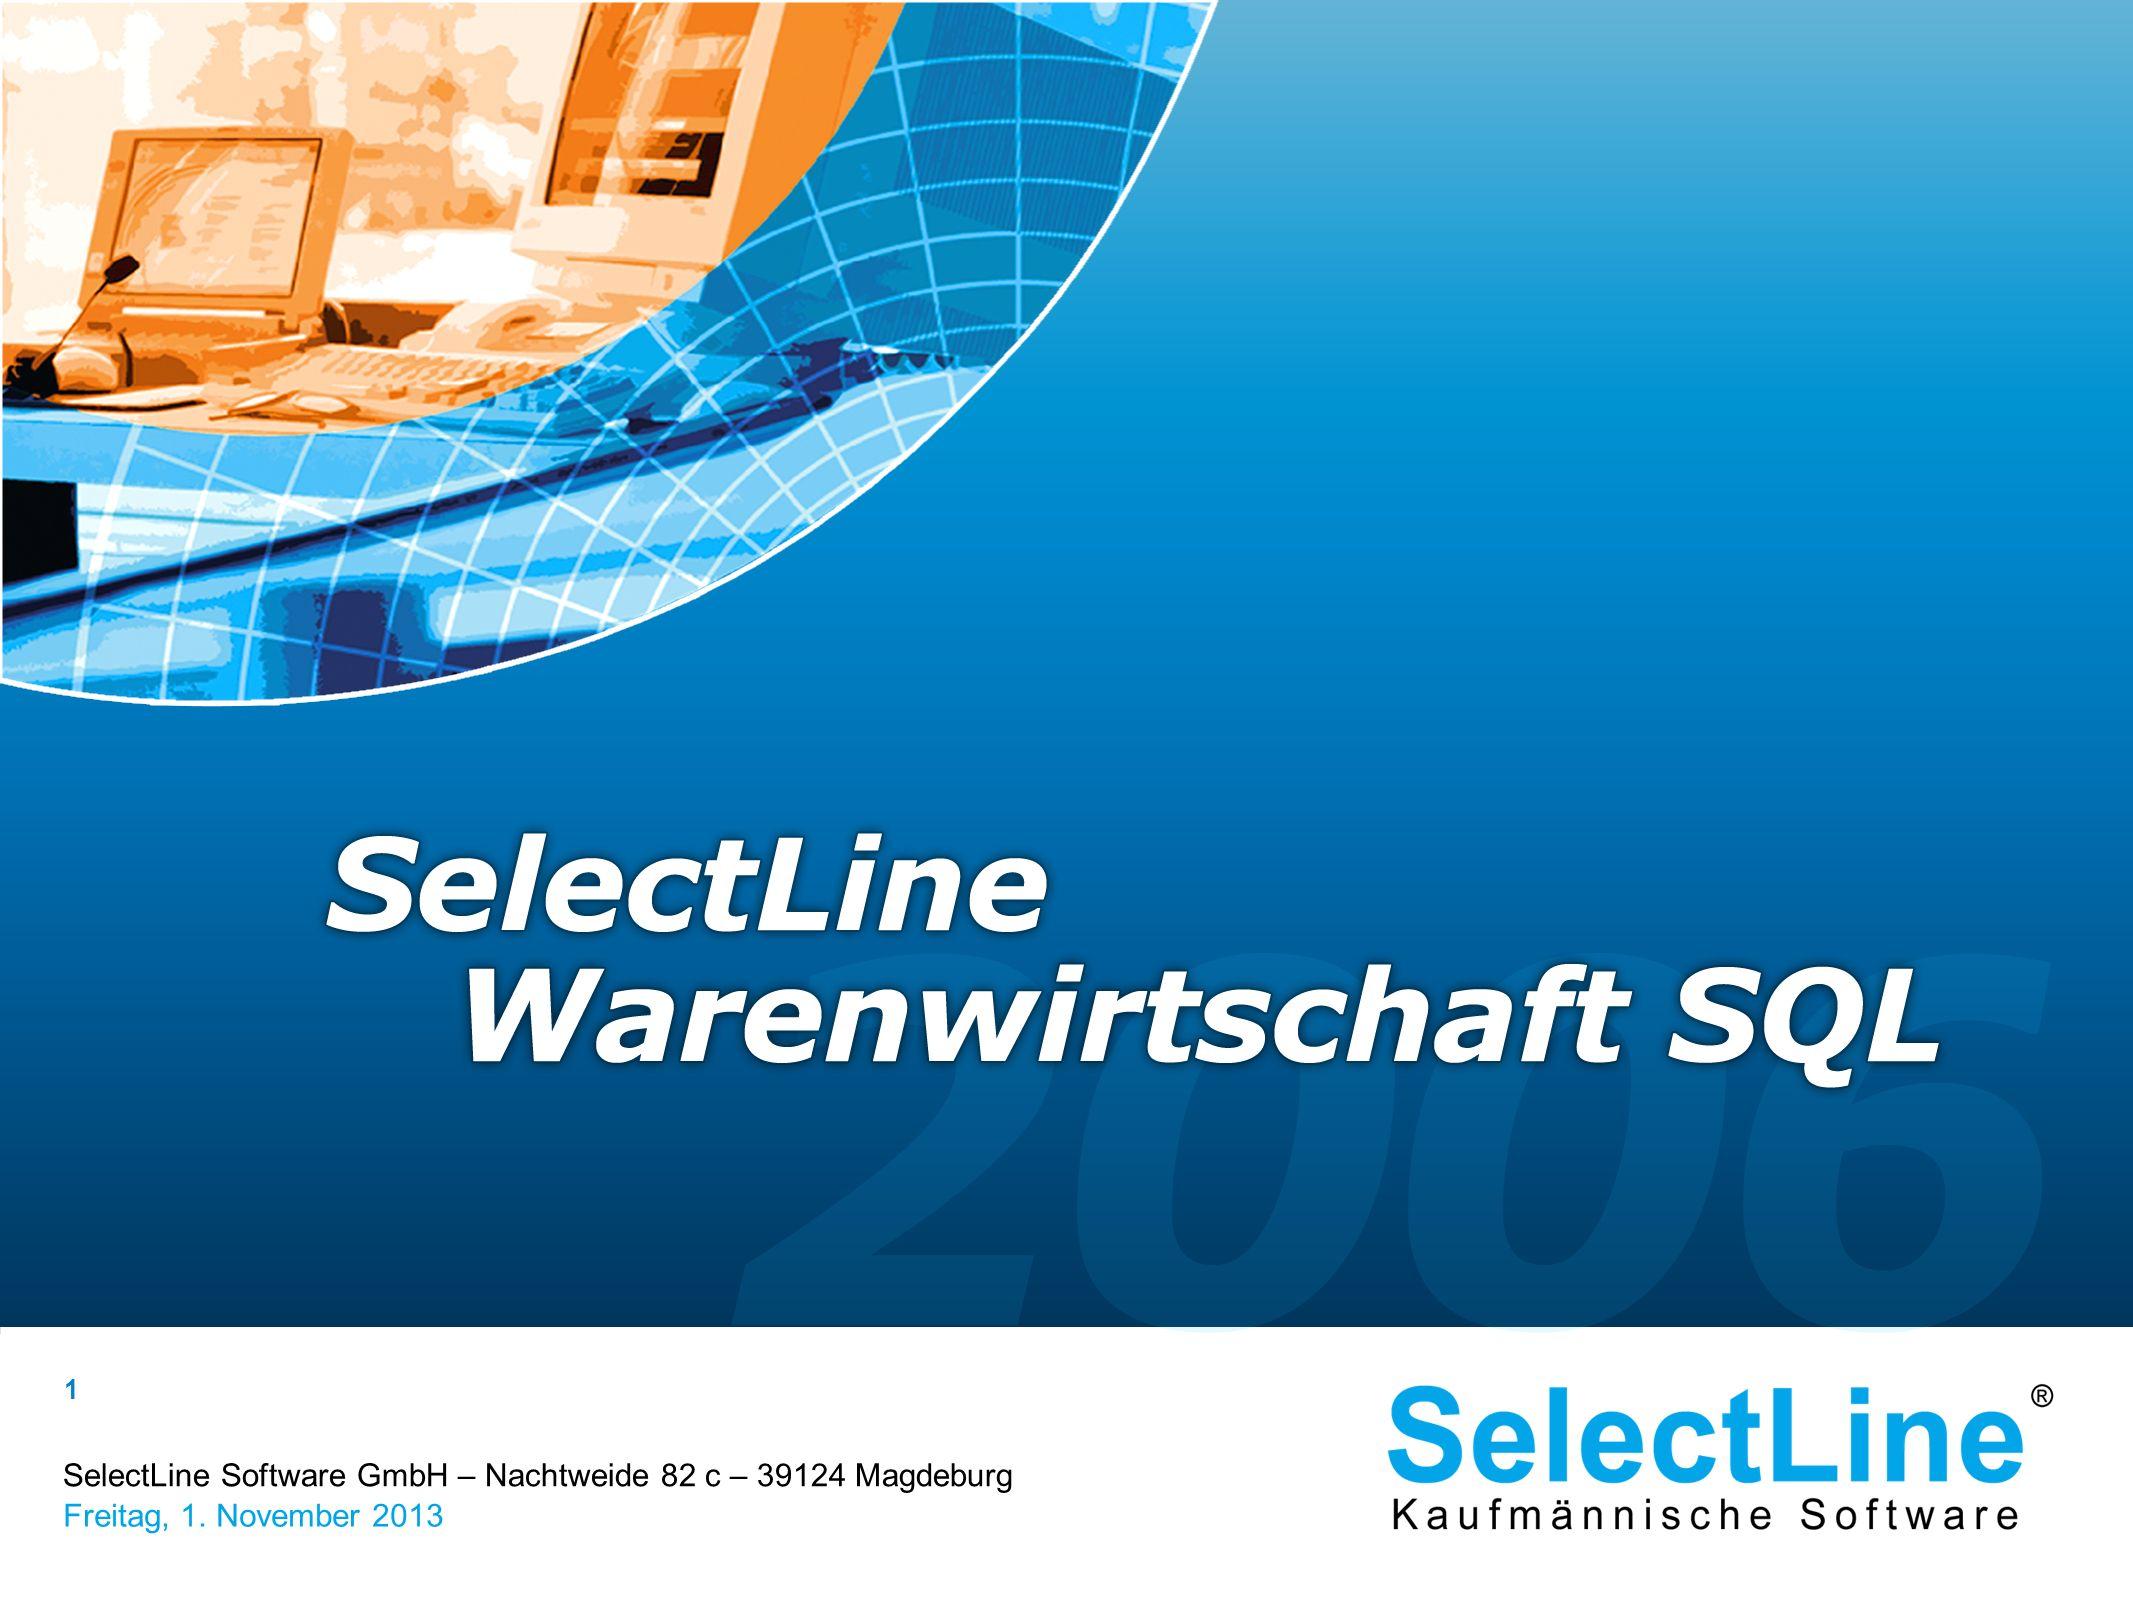 SelectLine Software GmbH – Nachtweide 82 c – 39124 Magdeburg Freitag, 1. November 2013 1